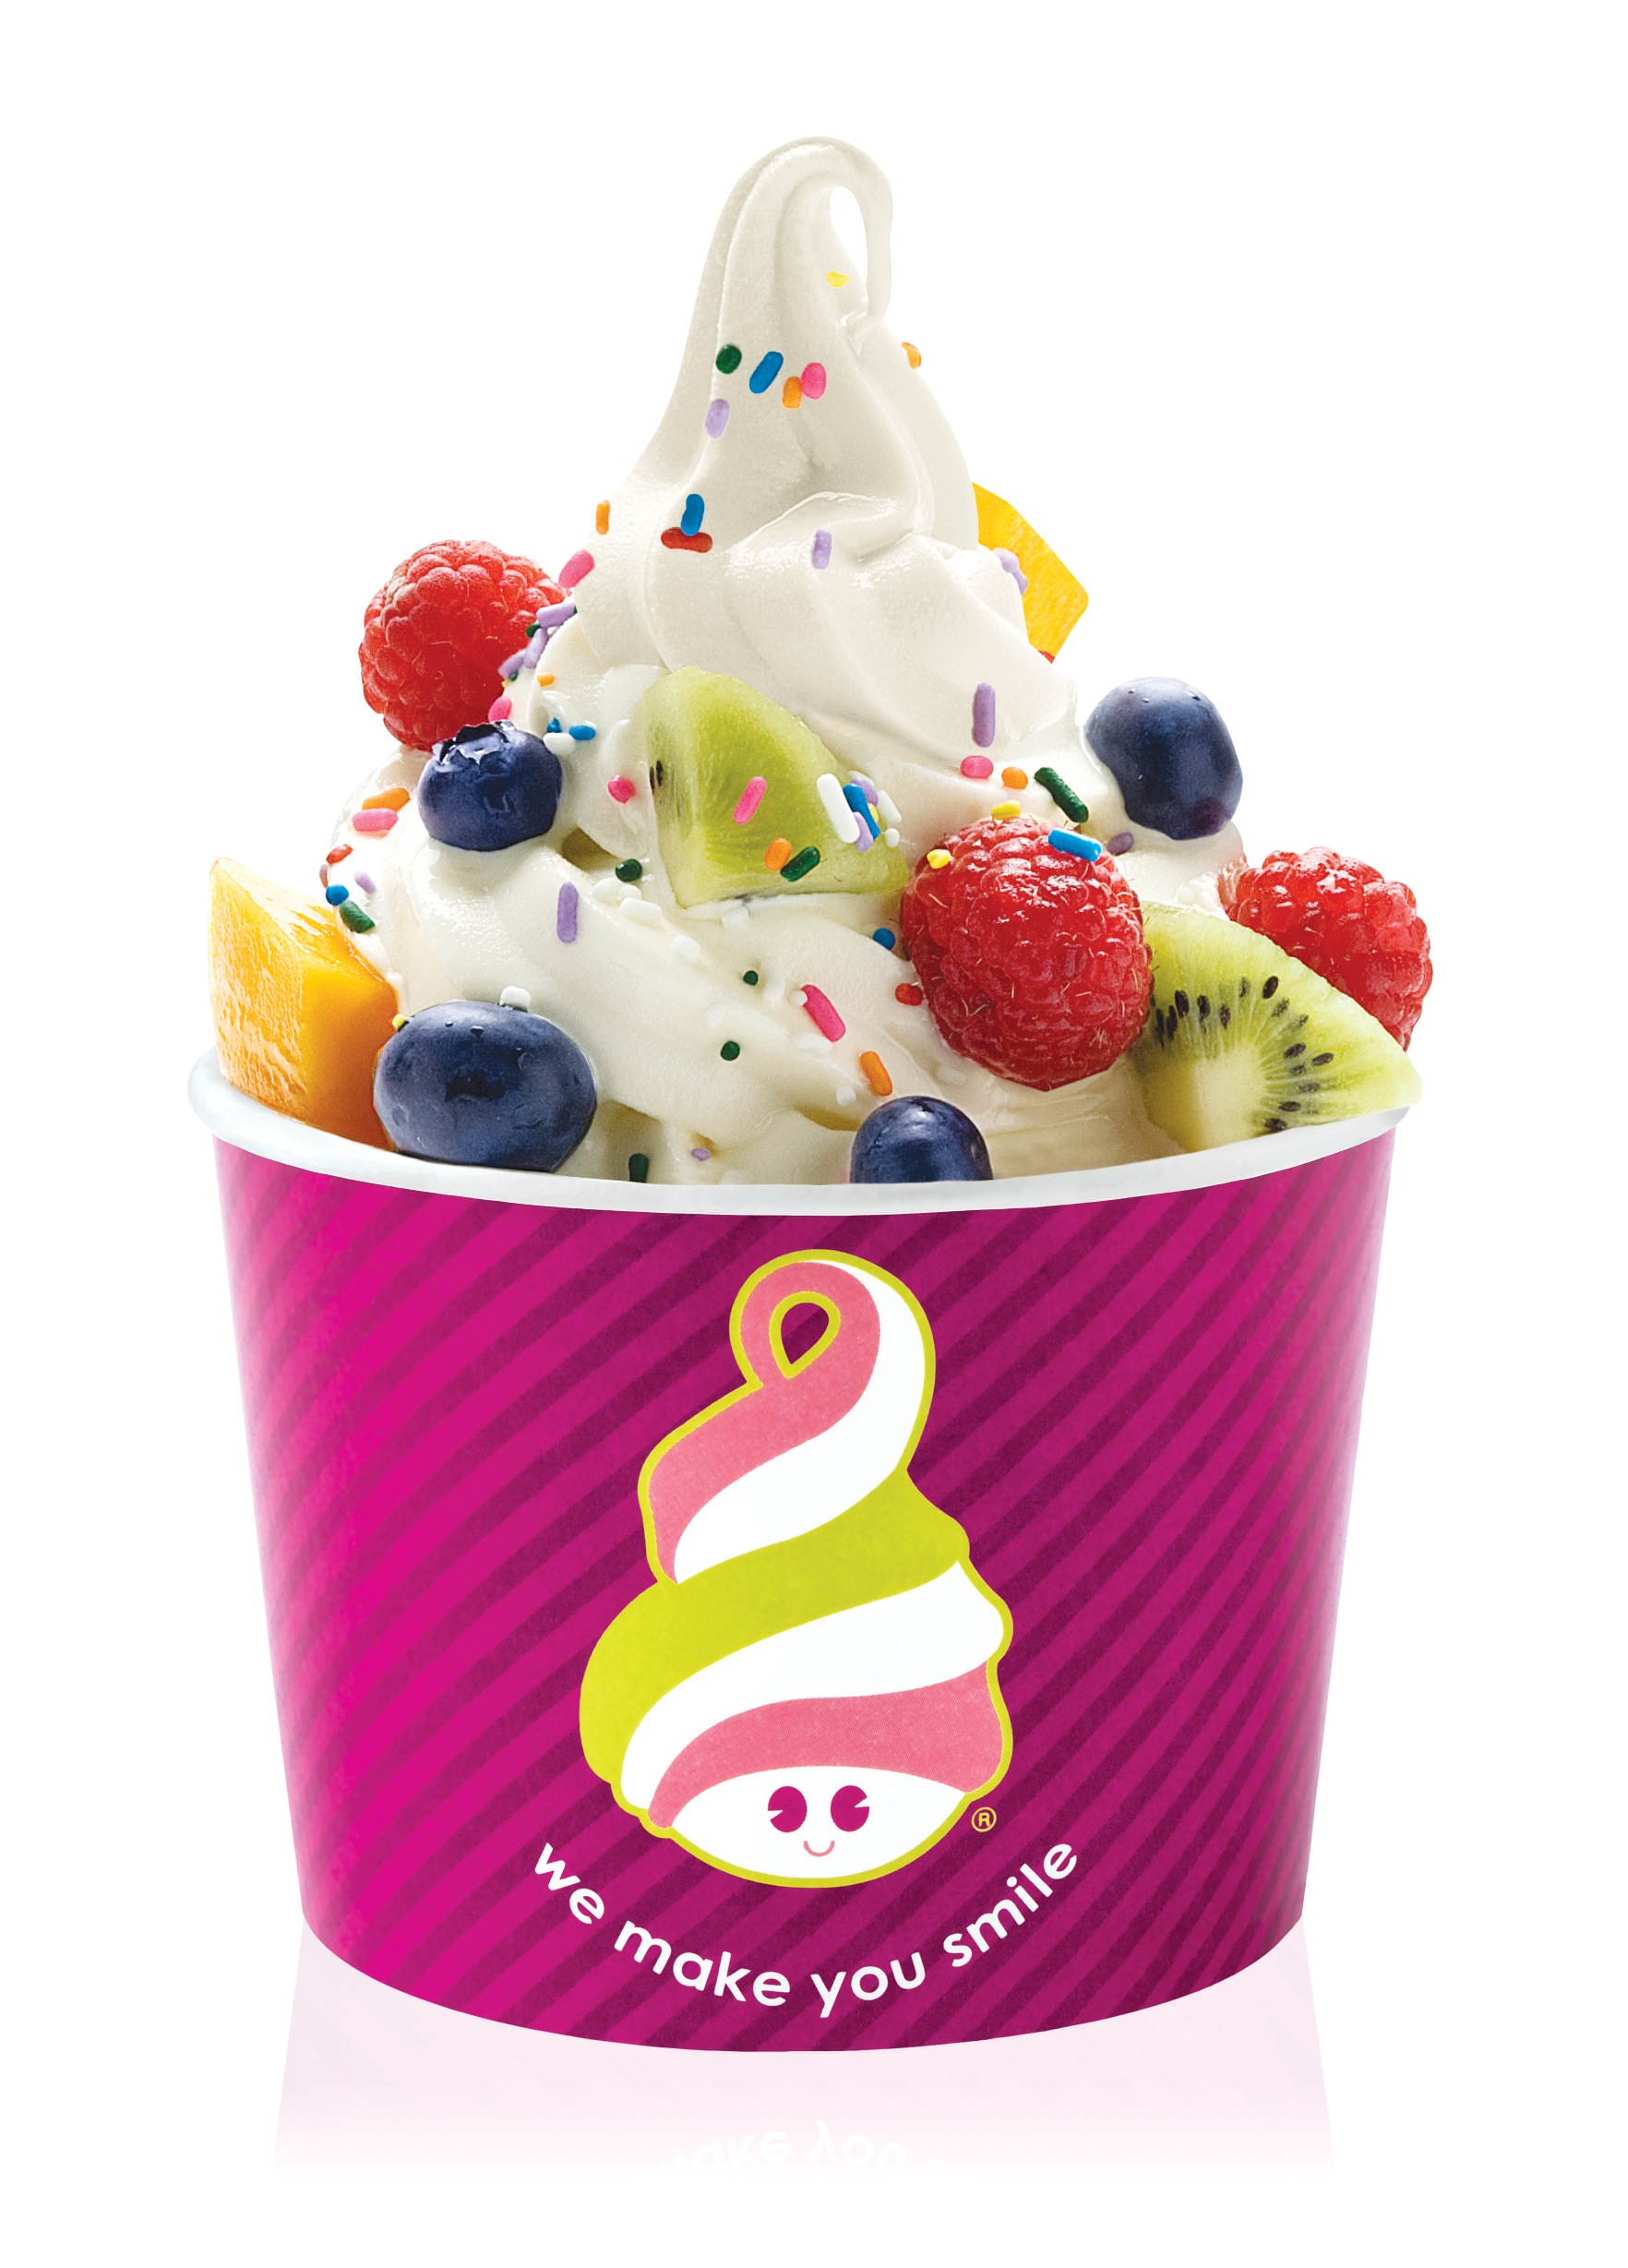 Menchie s to open in hiram with free frozen yogurt dallas hiram ga patch